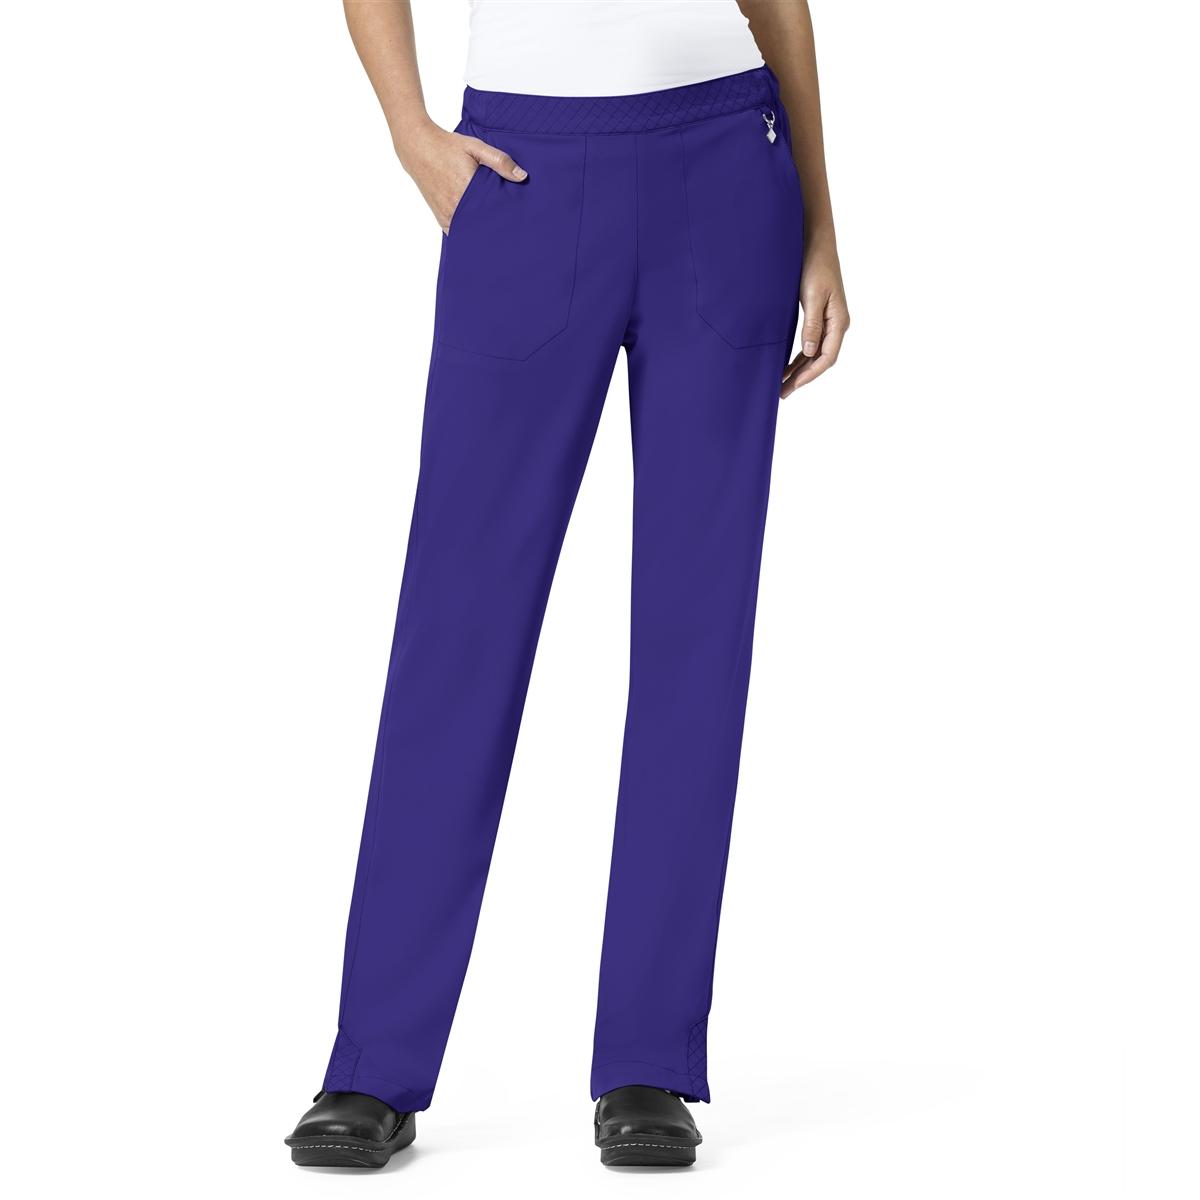 102f084ae17 Vera Bradley Women's Straight Leg Matilde Elastic Waistband Pant